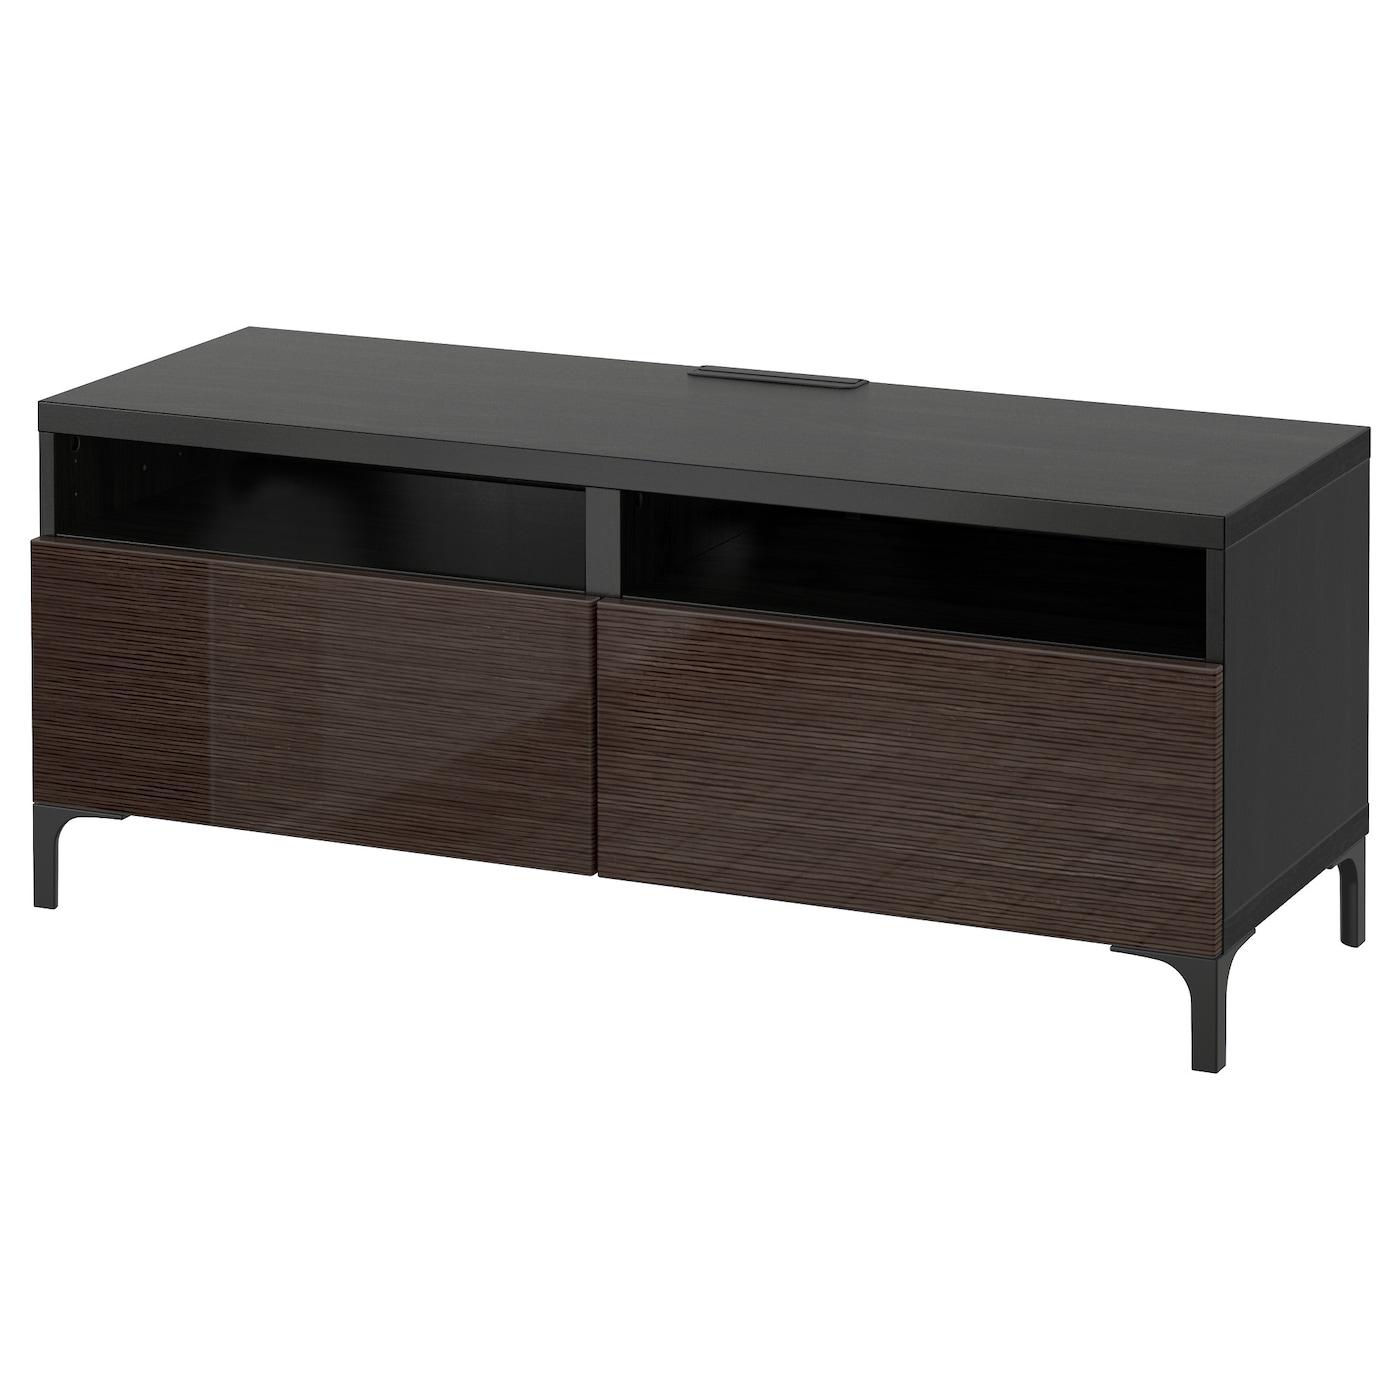 Best Tv Bench With Drawers Black Brown Selsviken High Gloss Brown 120x40x48 Cm Ikea